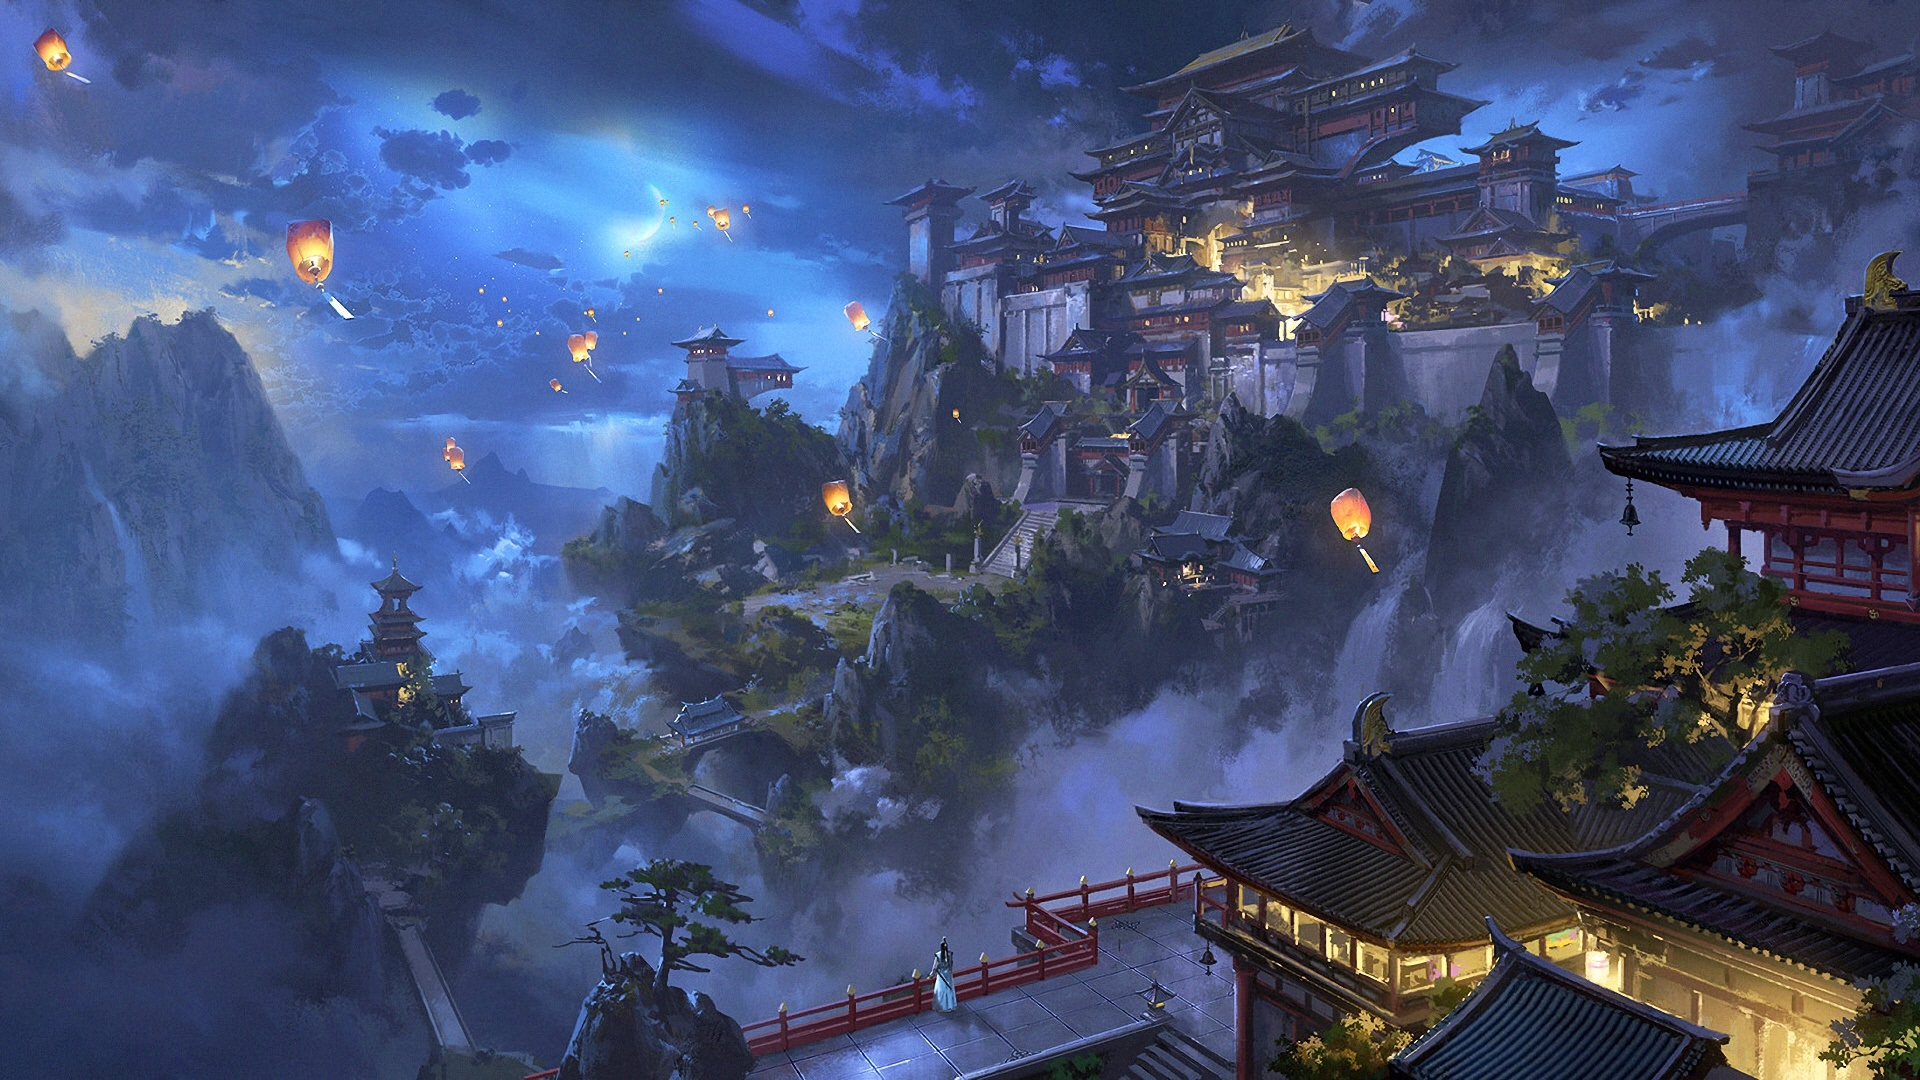 Wallpaper Chinese Landscape City Mountains Trees Lanterns Retro